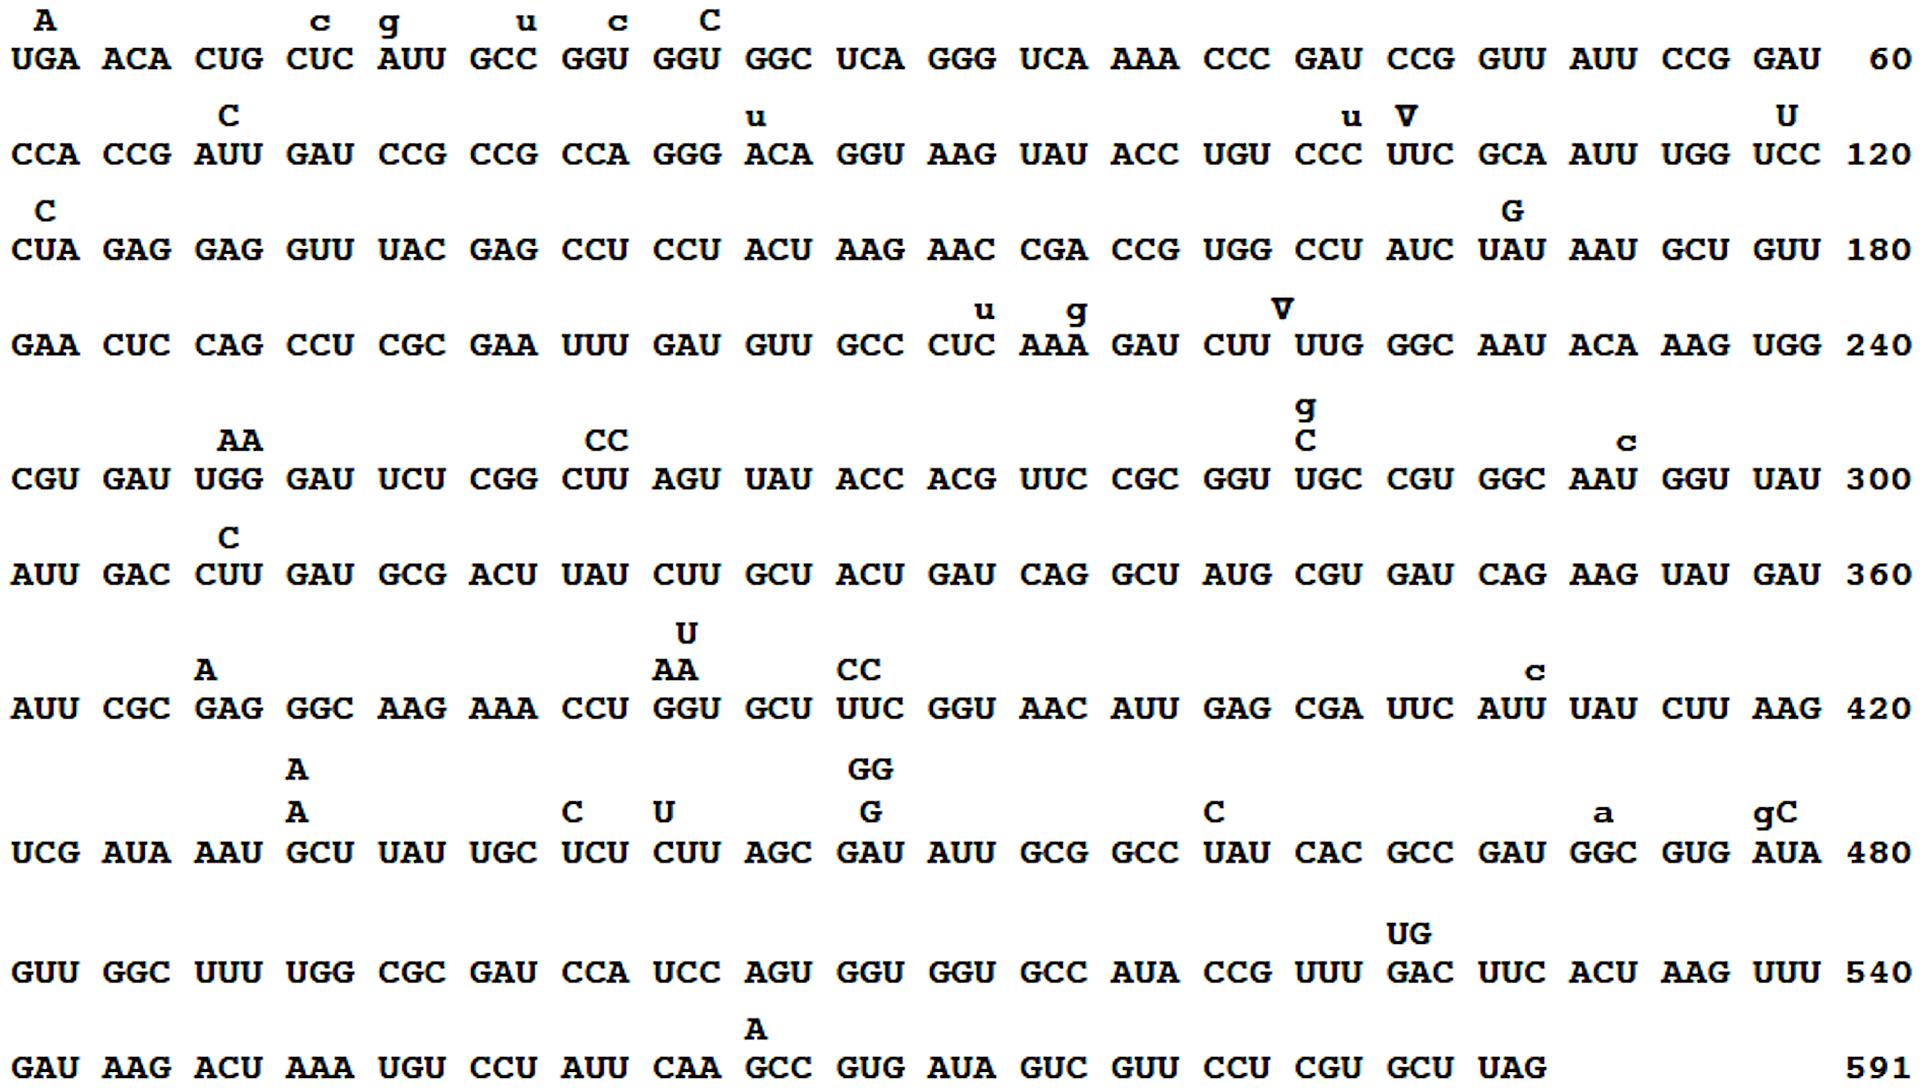 Spectrum of spontaneous Qß mutations.